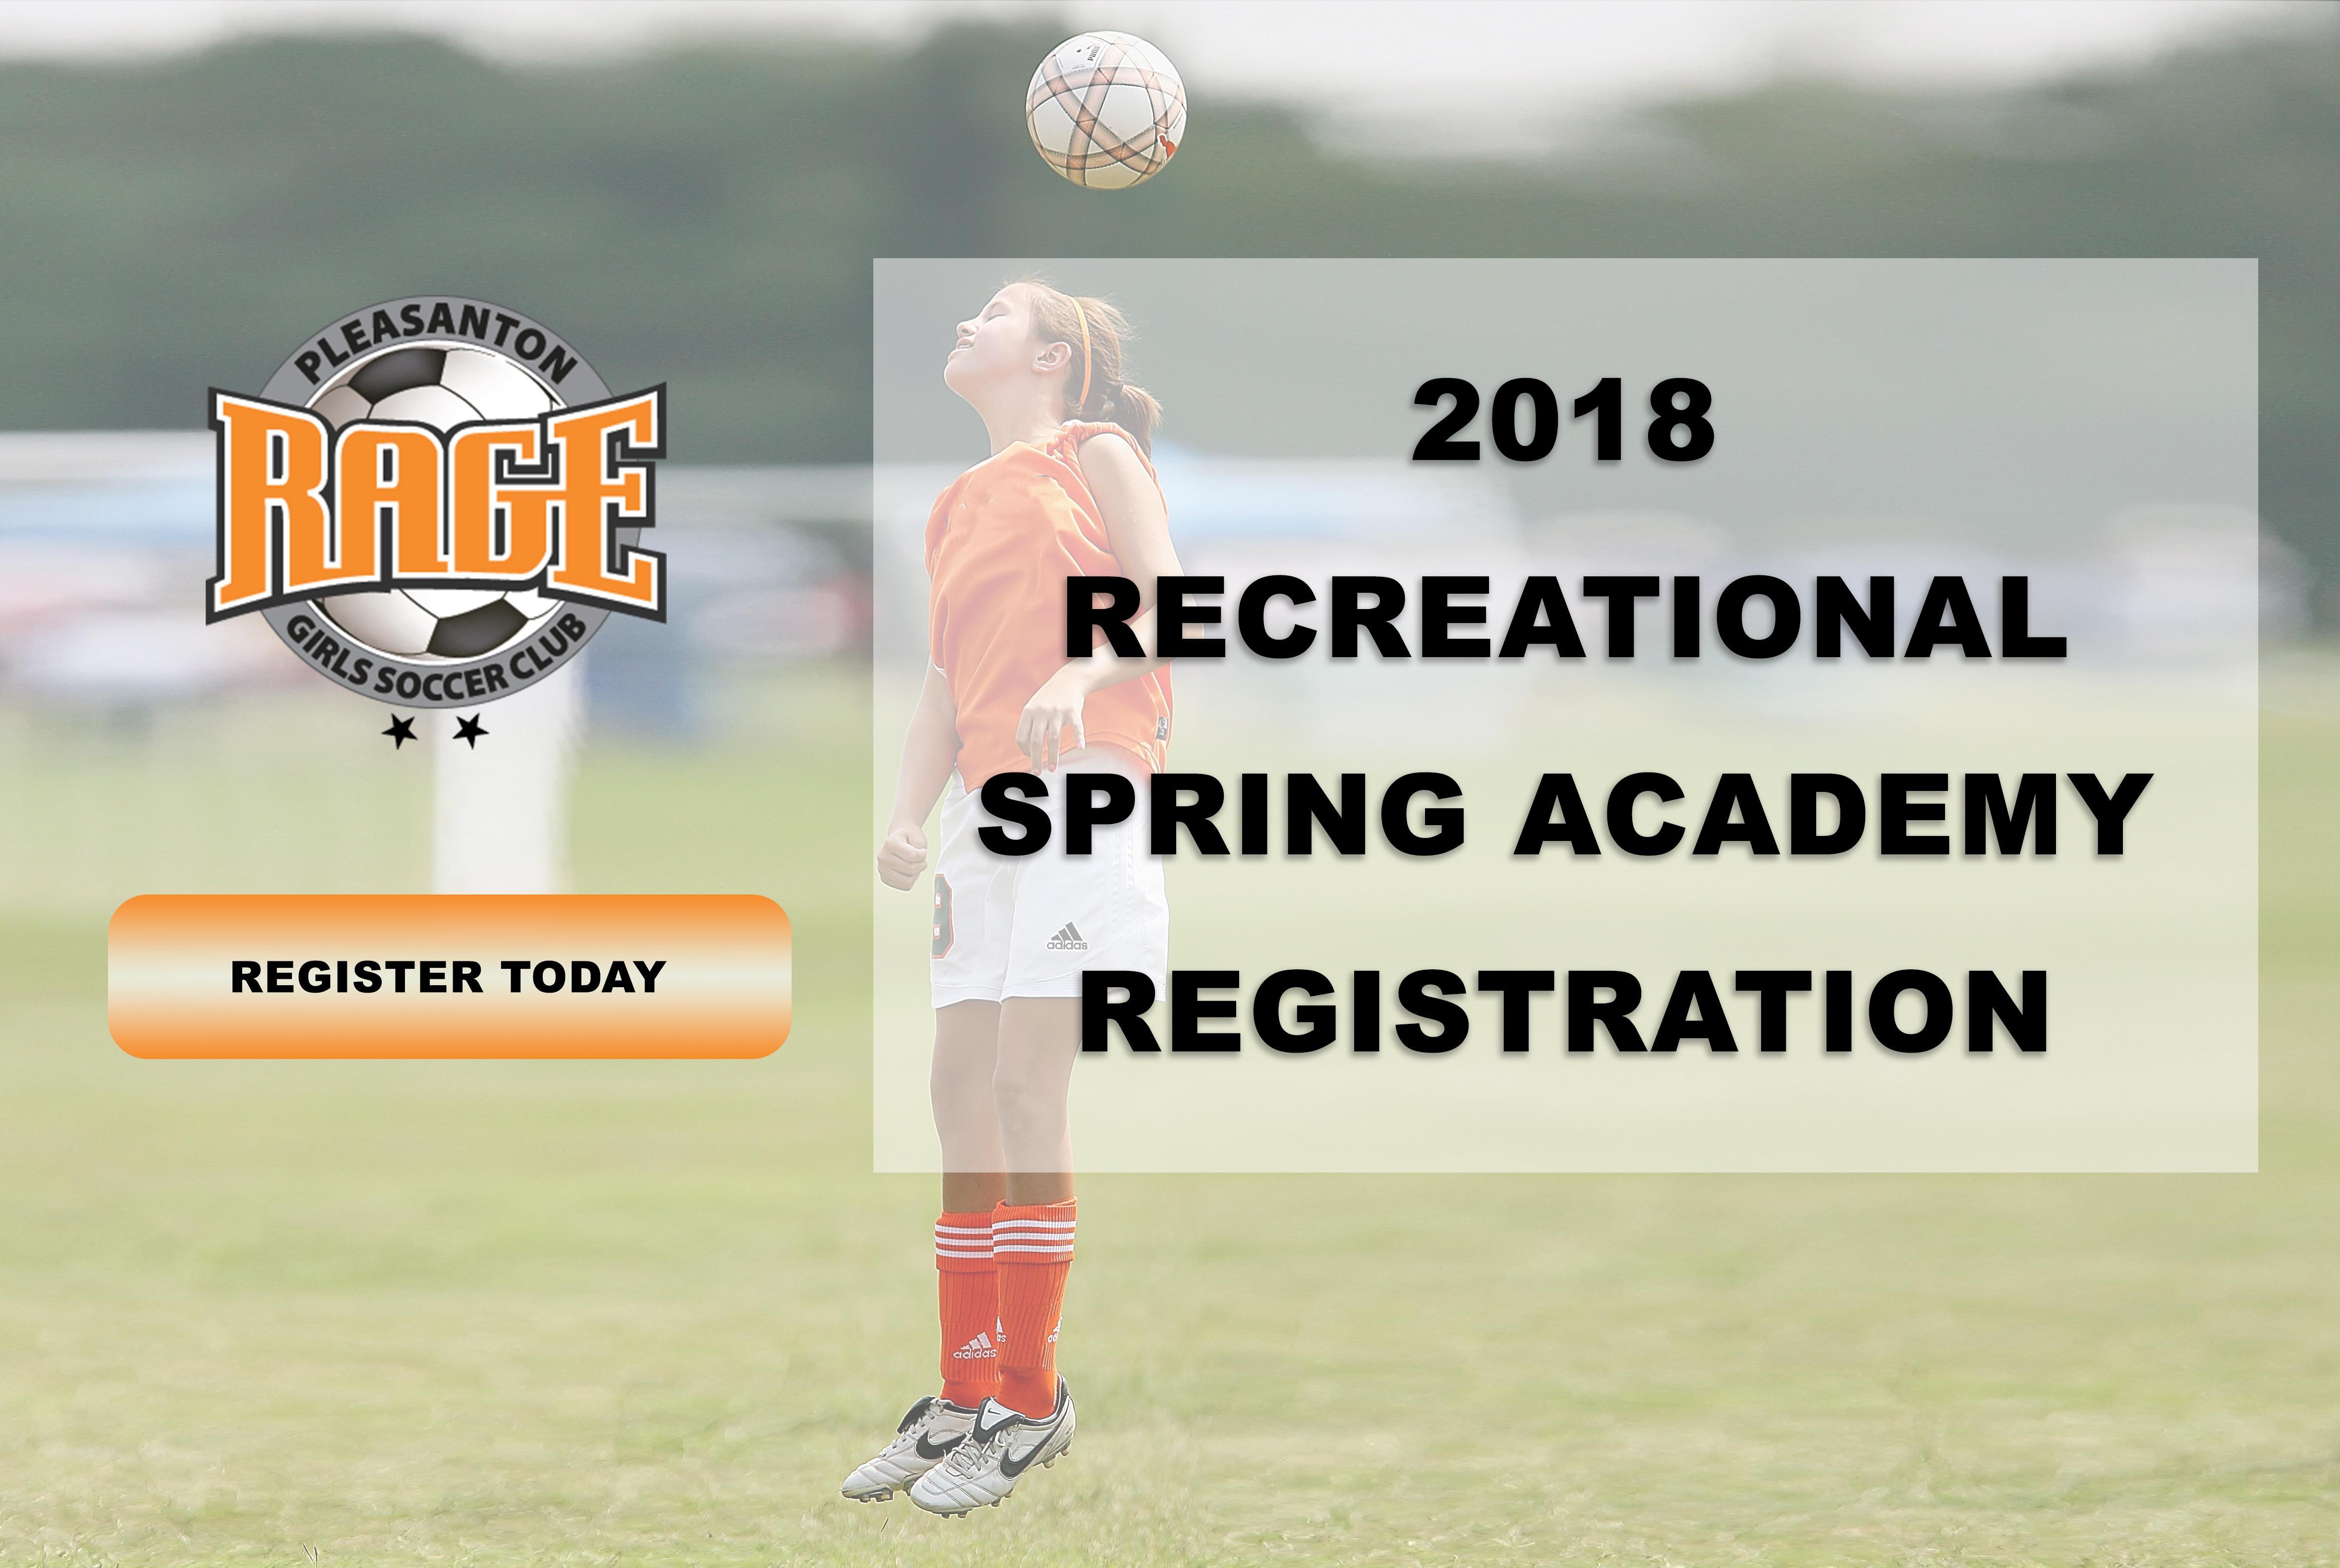 18 spring rec academy